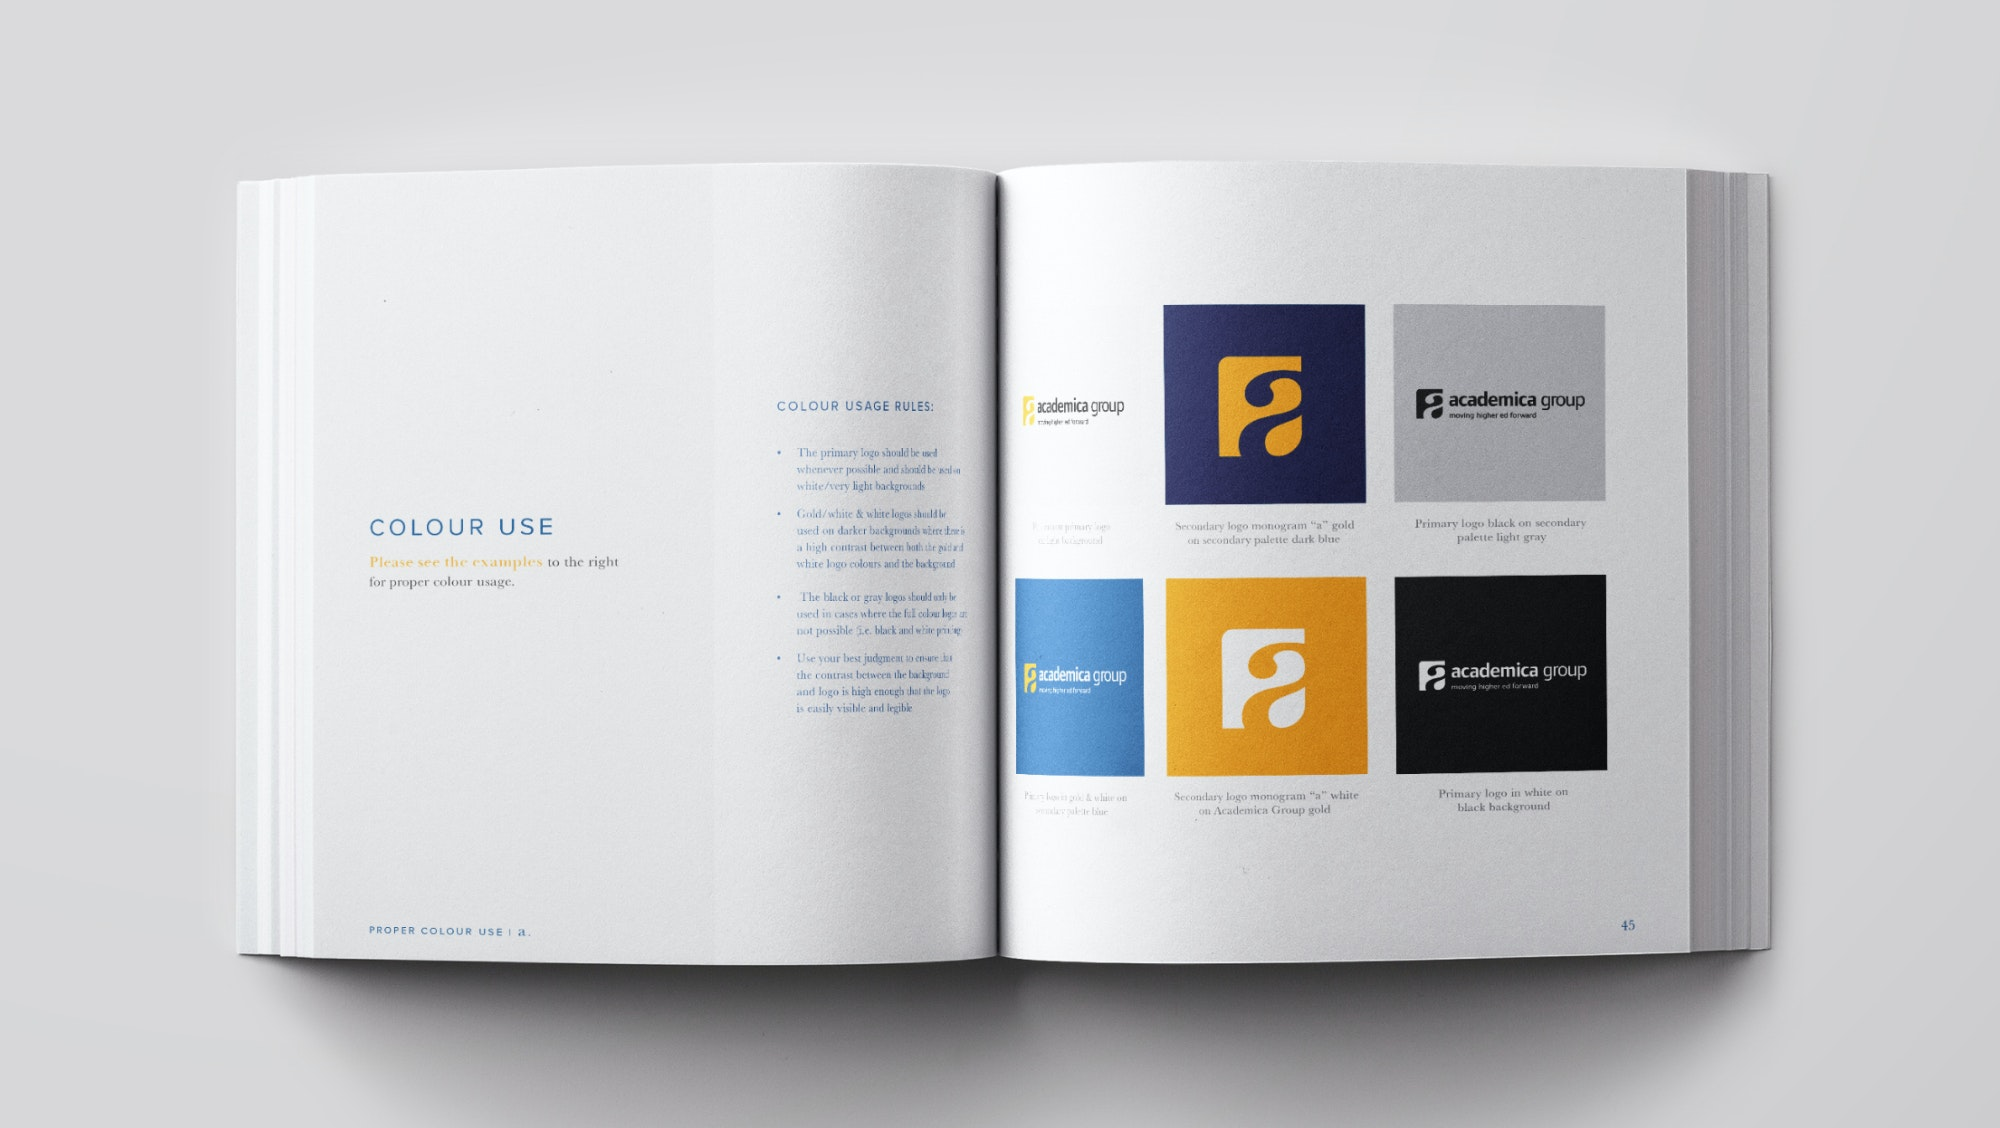 Academica Brand Guide Colour Use